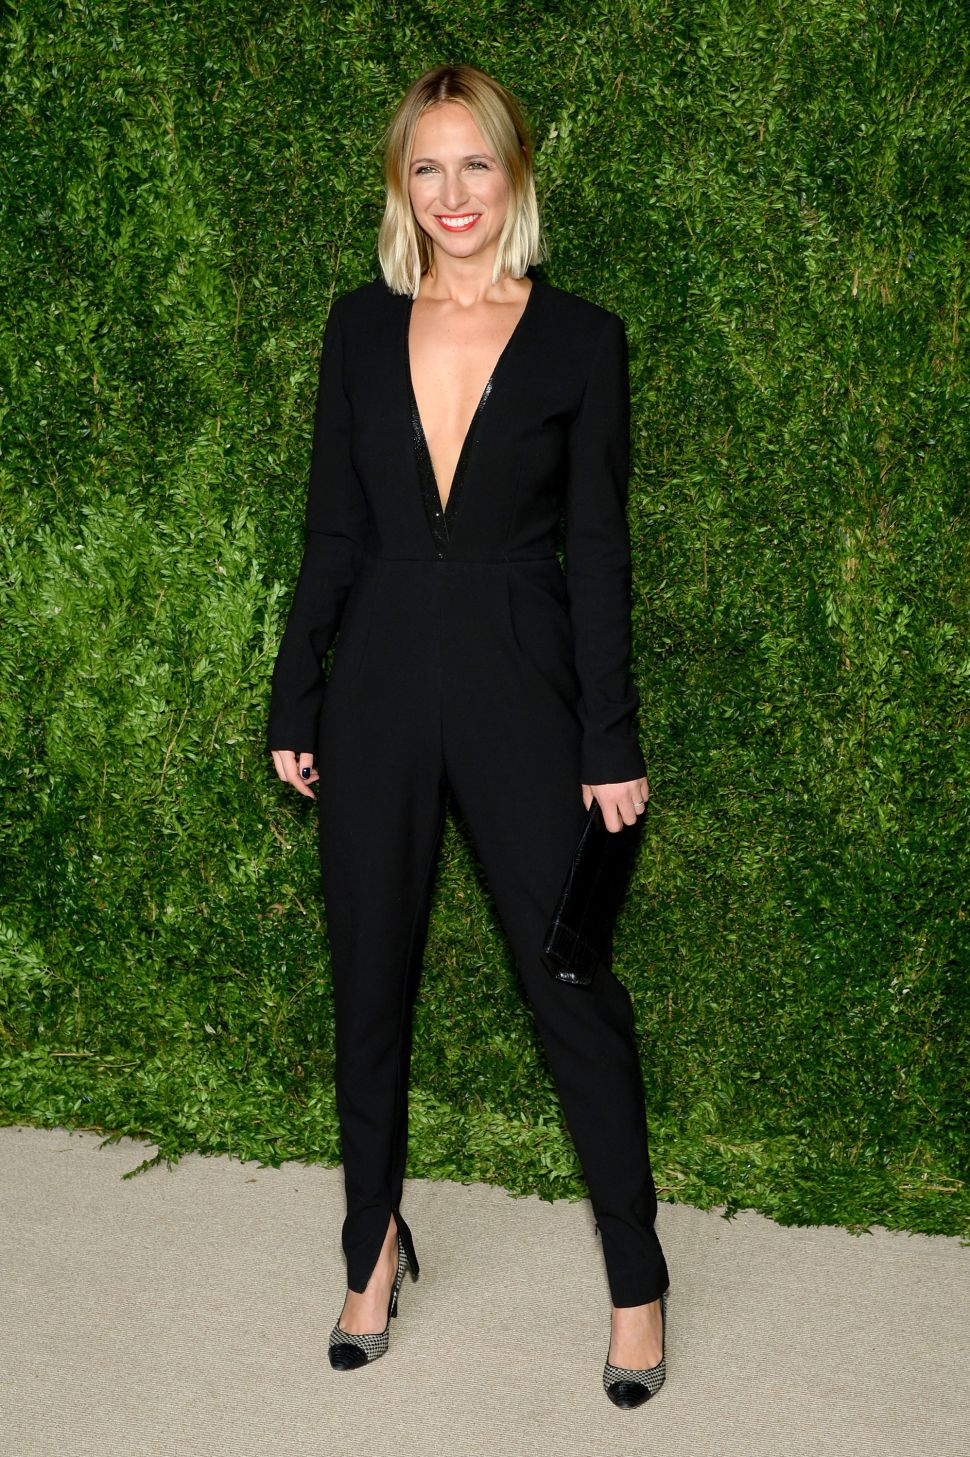 Fashion Roundup: Misha Nonoo Skips Fashion Week, A$AP Rocky Designs for Guess